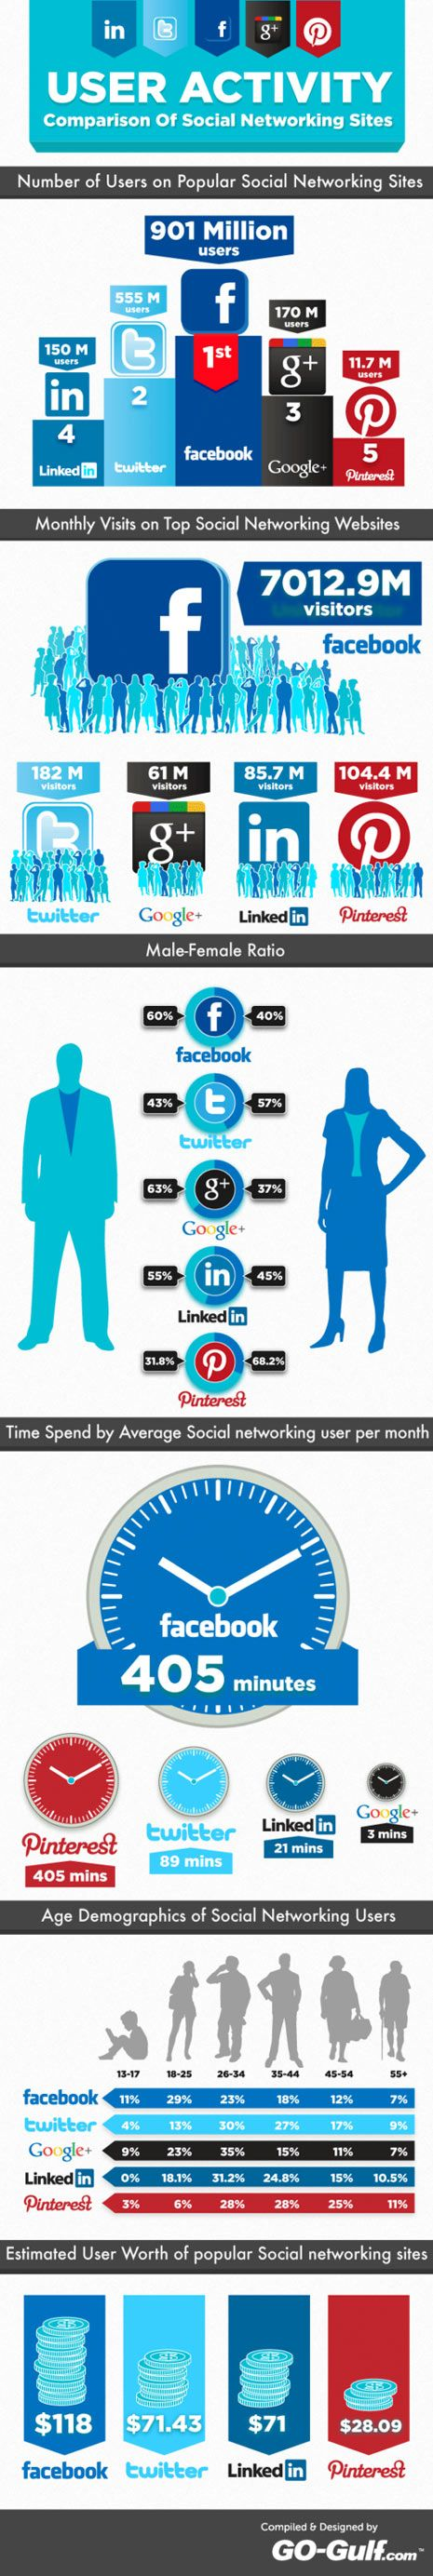 user activity comparison of social media [Facebook, Twitter, Google+, Linkedin, Pinterest] #infographic